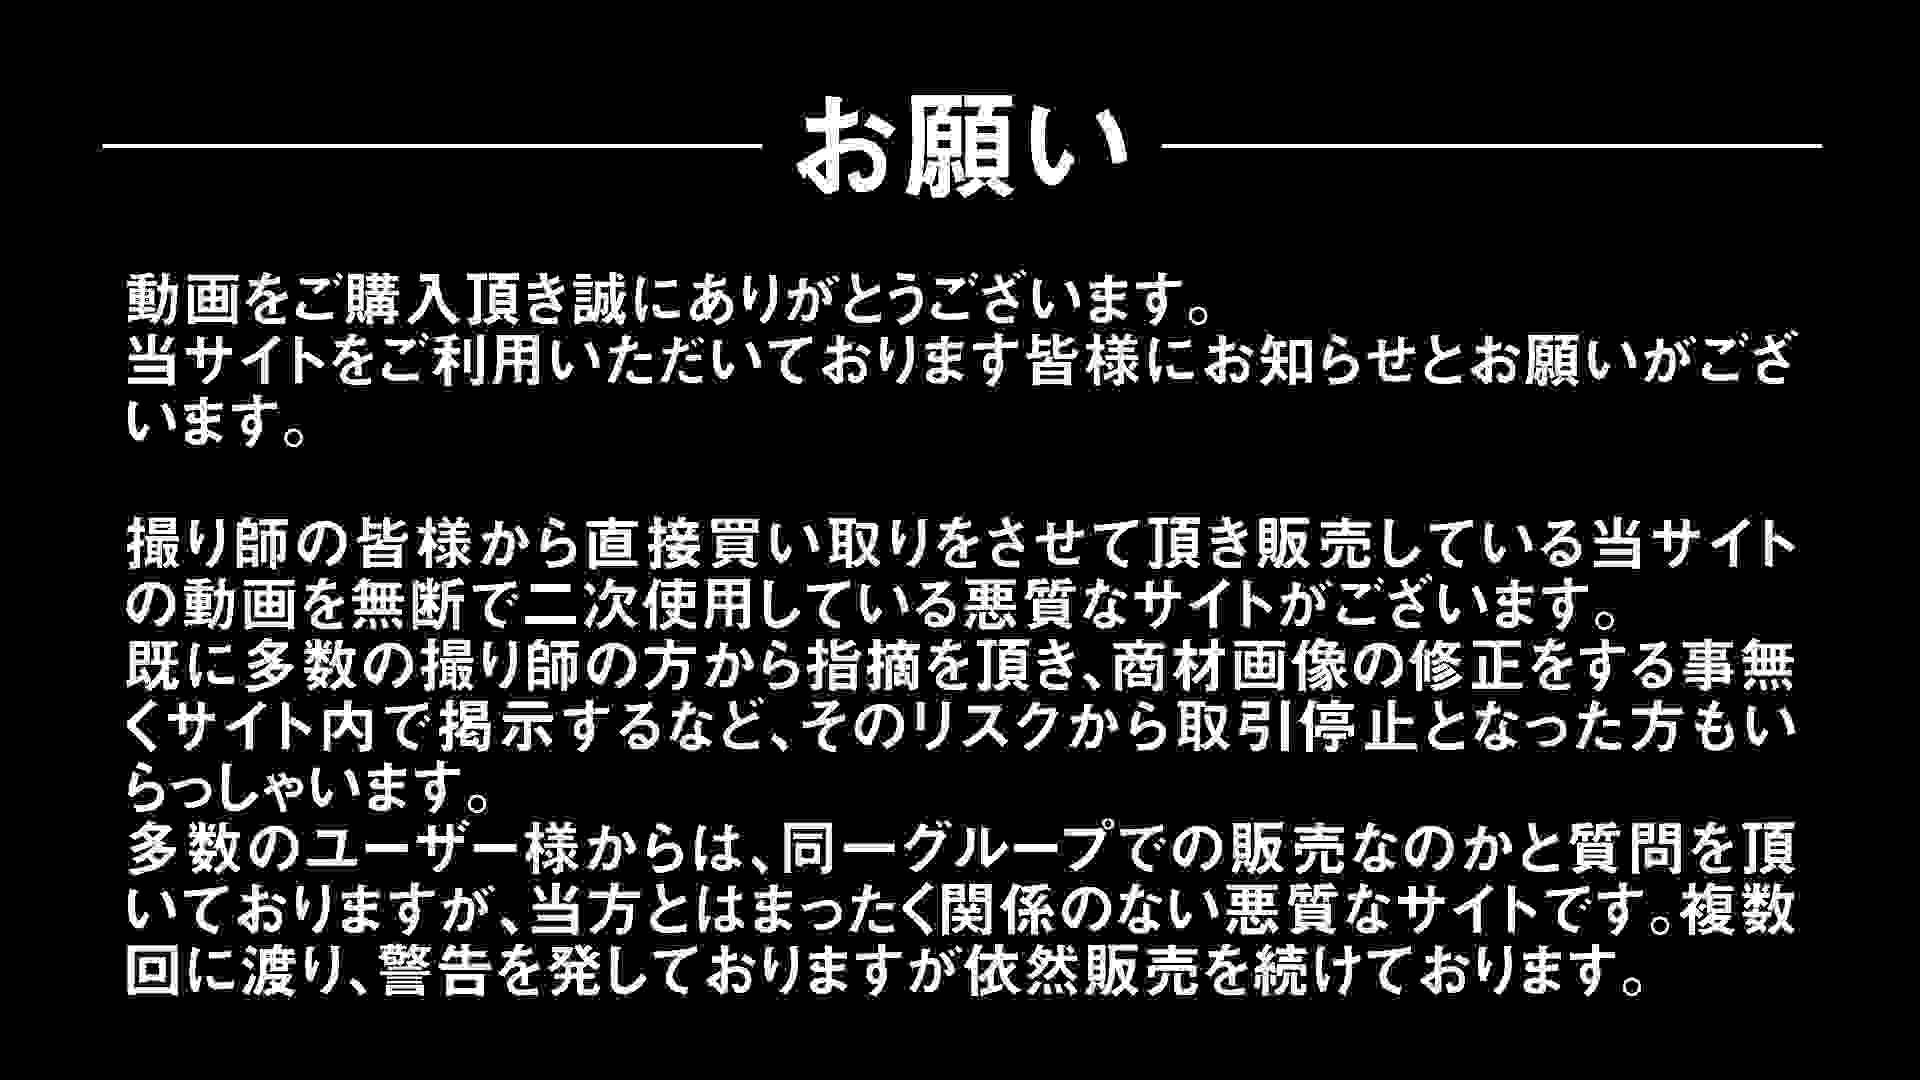 Aquaな露天風呂Vol.299 盗撮シリーズ | 露天風呂編  82PIX 21